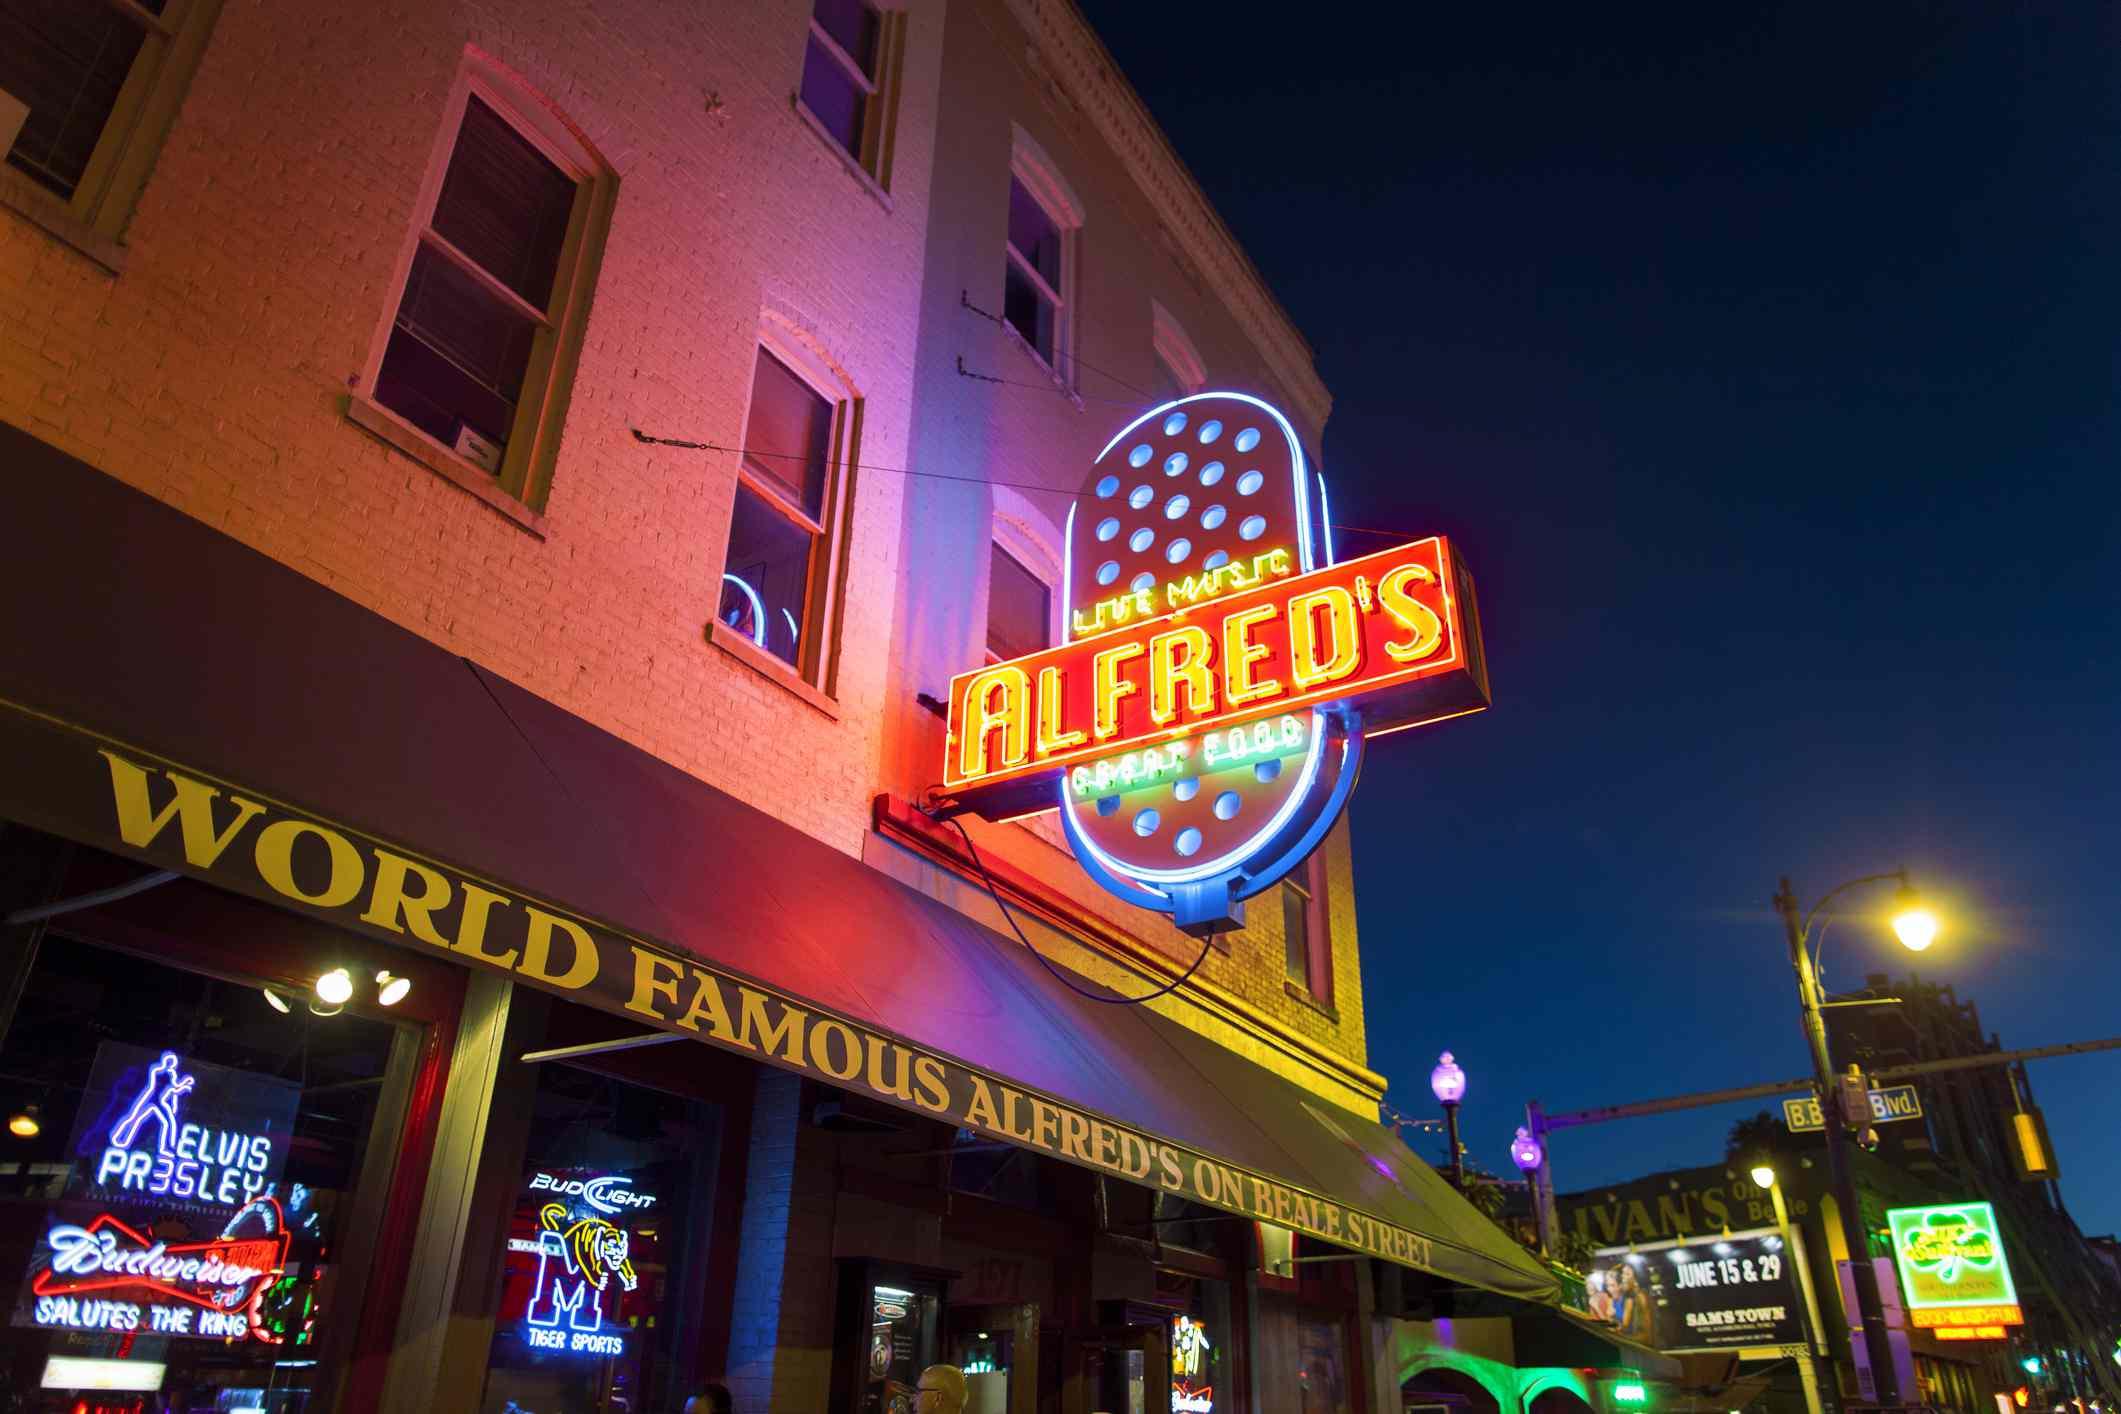 Alfred's on Beale Street, Memphis, TN